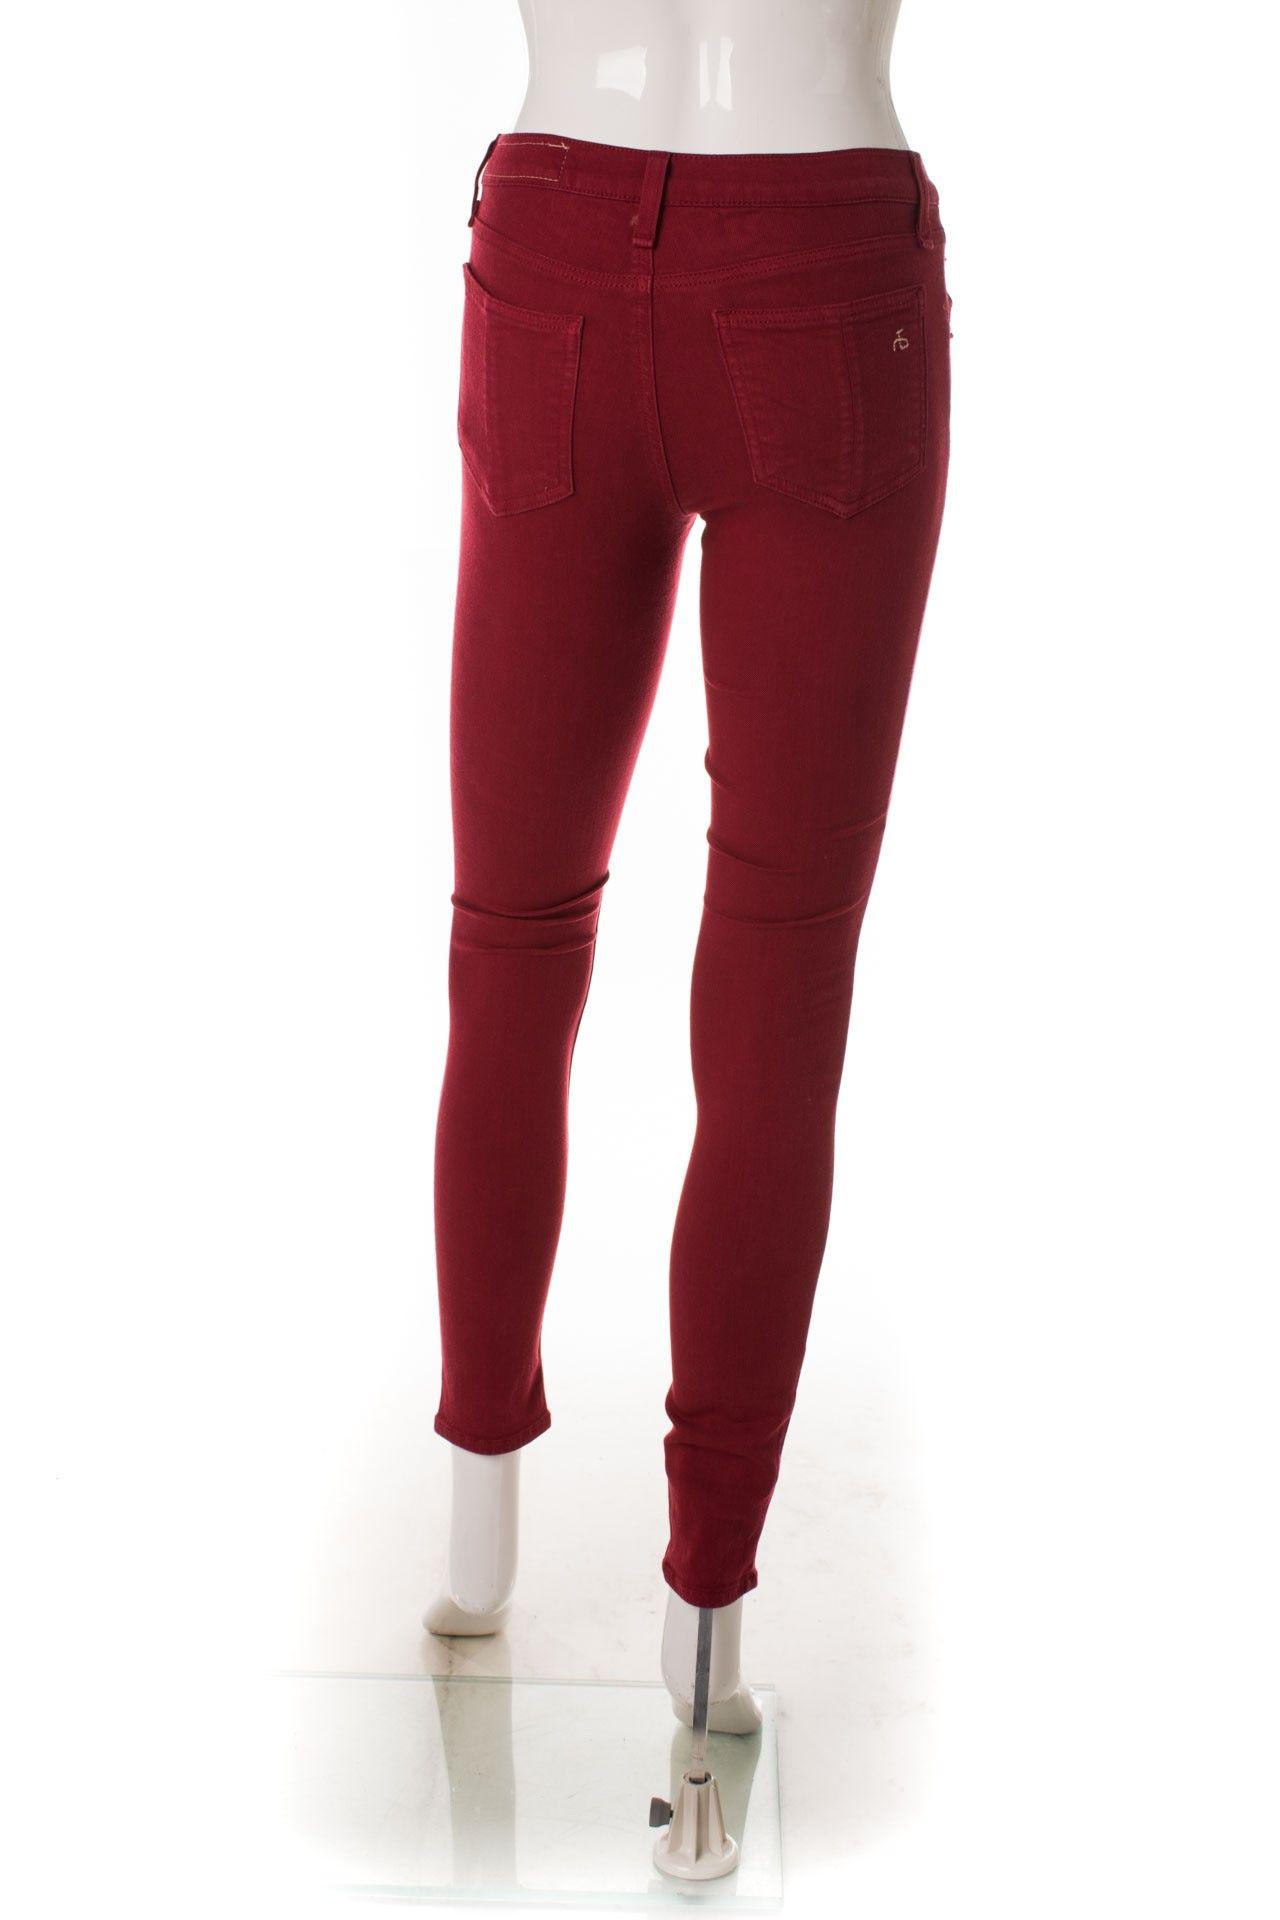 Rag & Bone - Calça Skinny Red - Foto 2